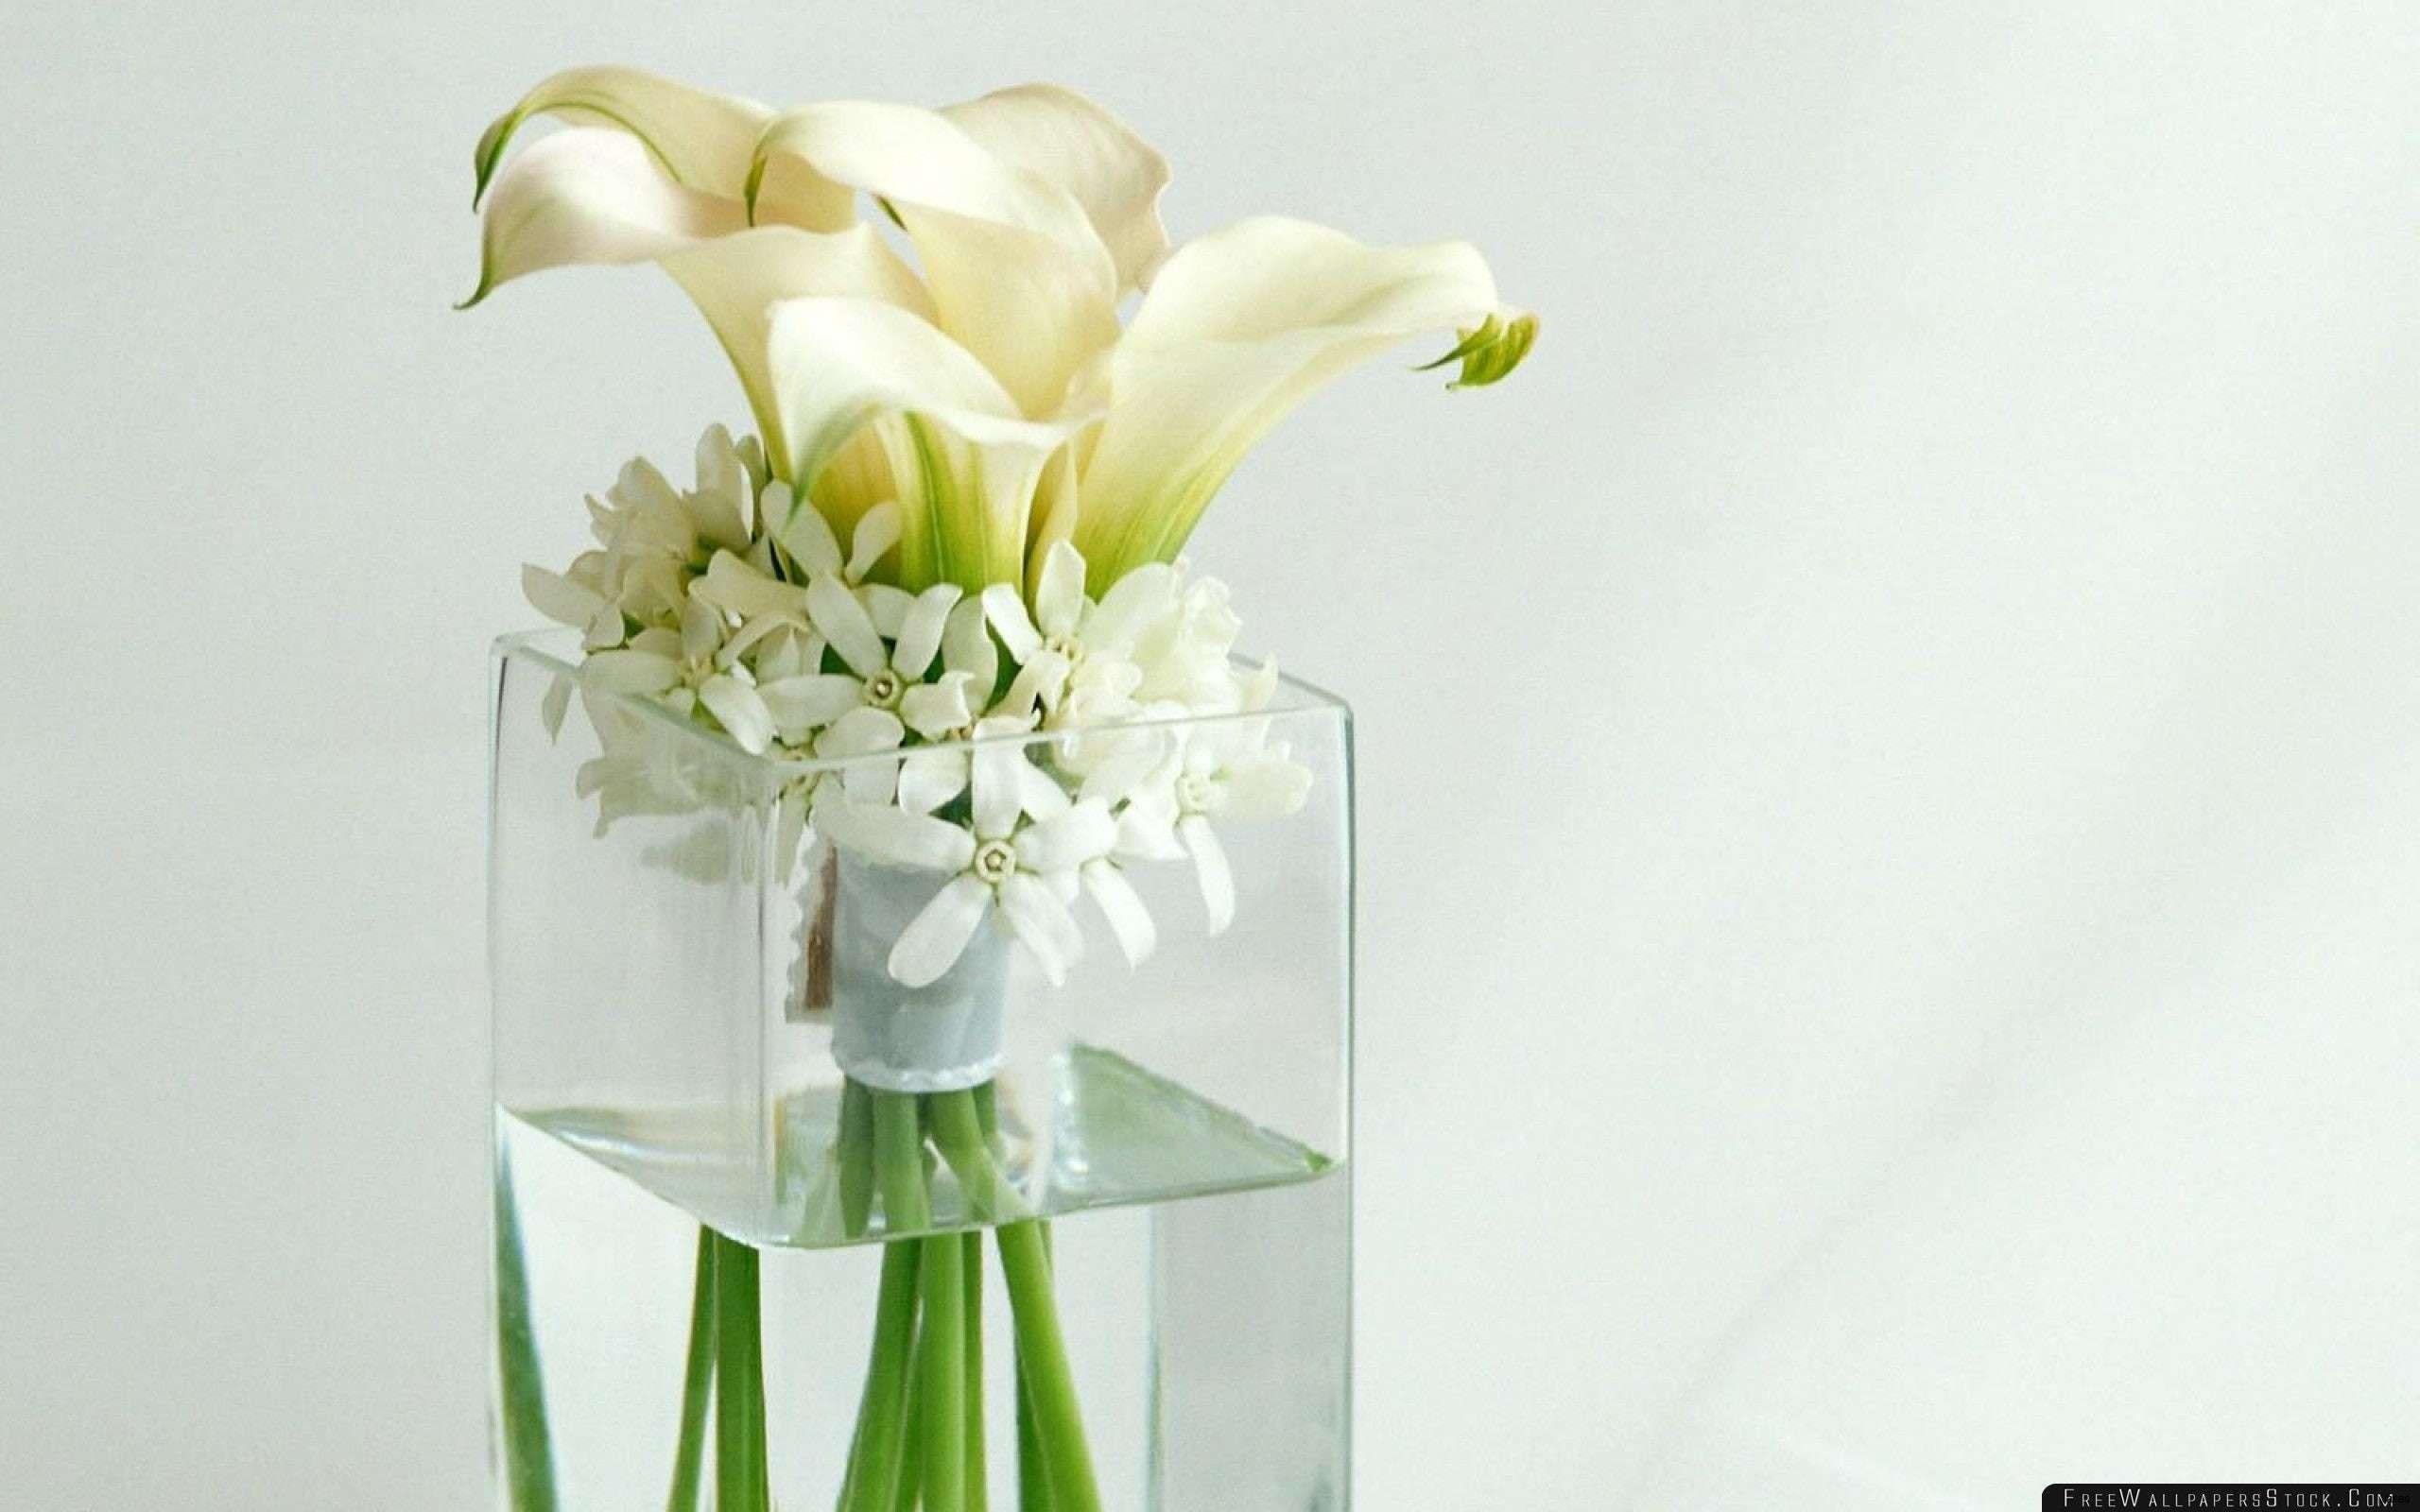 Tall Vase Centerpiece Ideas Vases Flowers In Water 0d Artificial Inspiration Glass Vase Centerpiece Ideas